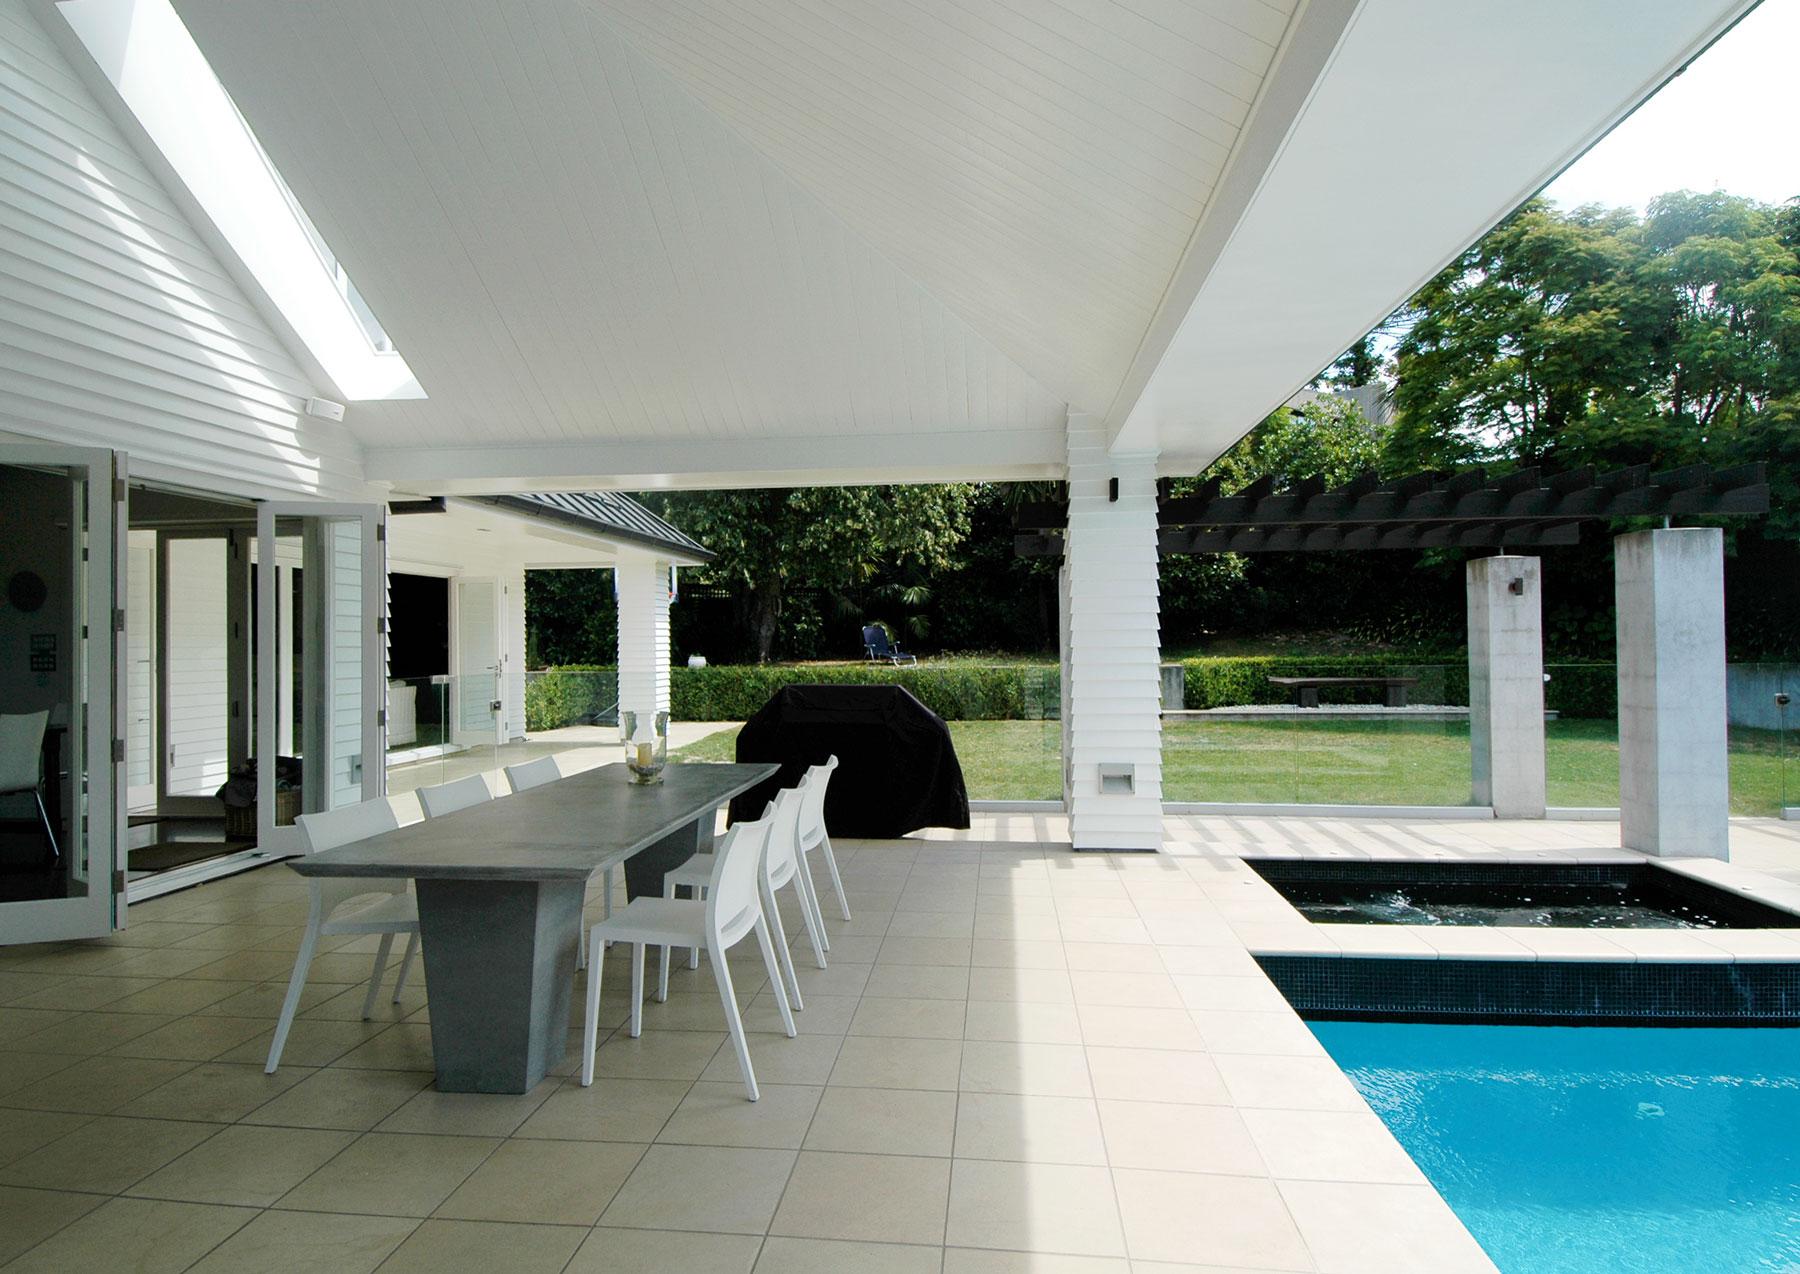 D-Leuschke-Kahn-Architects080101dadshouse---18.jpg